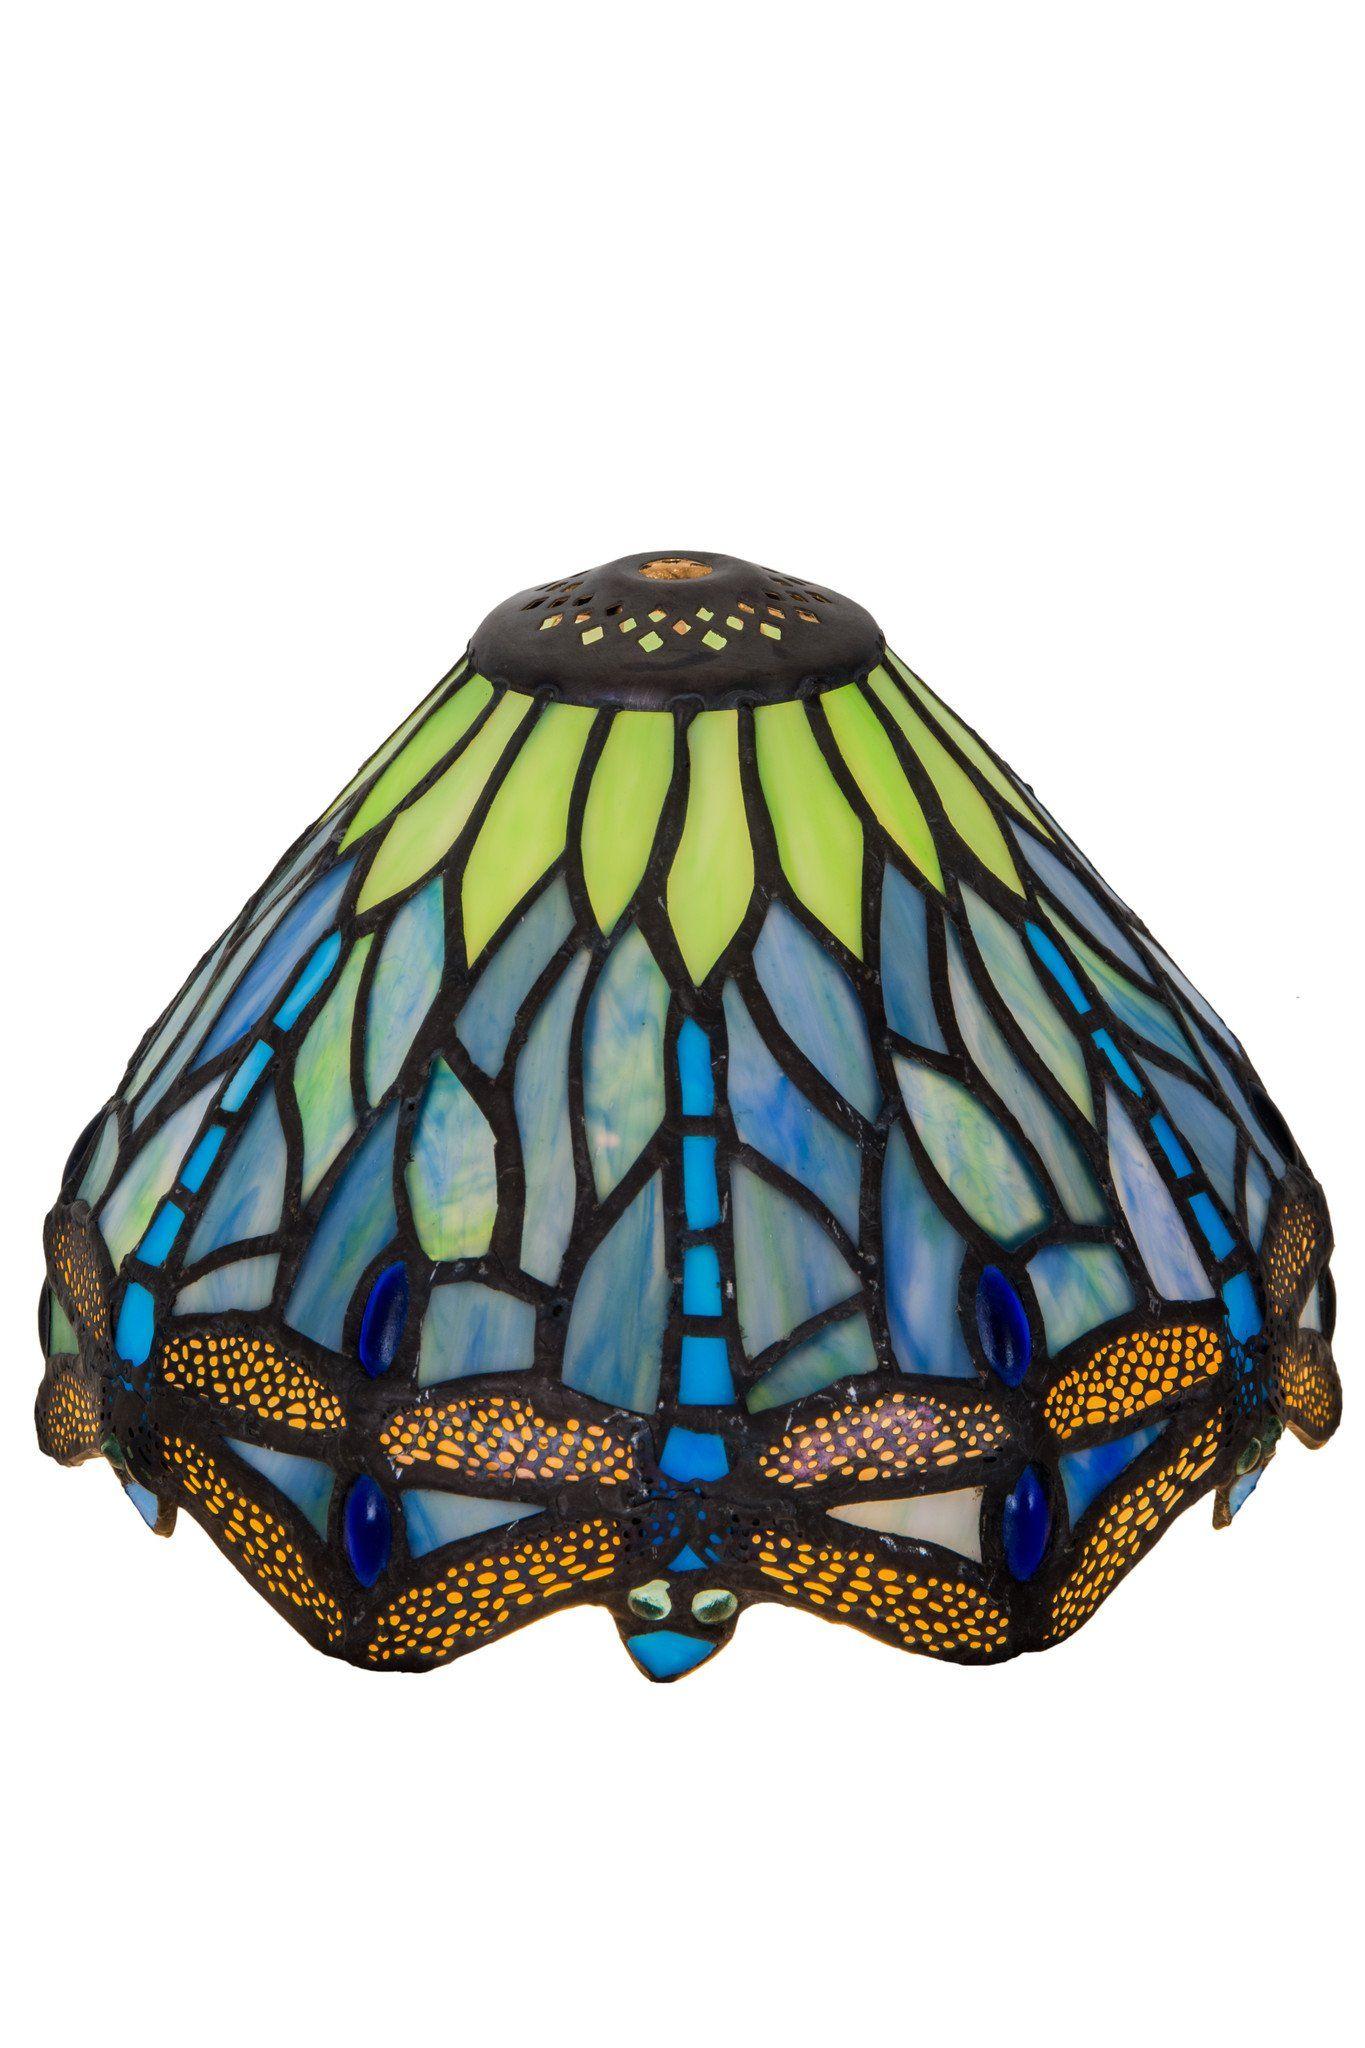 Meyda 7 Hang Hd Drgnfly Tiffany Style Lamp Shades Shades